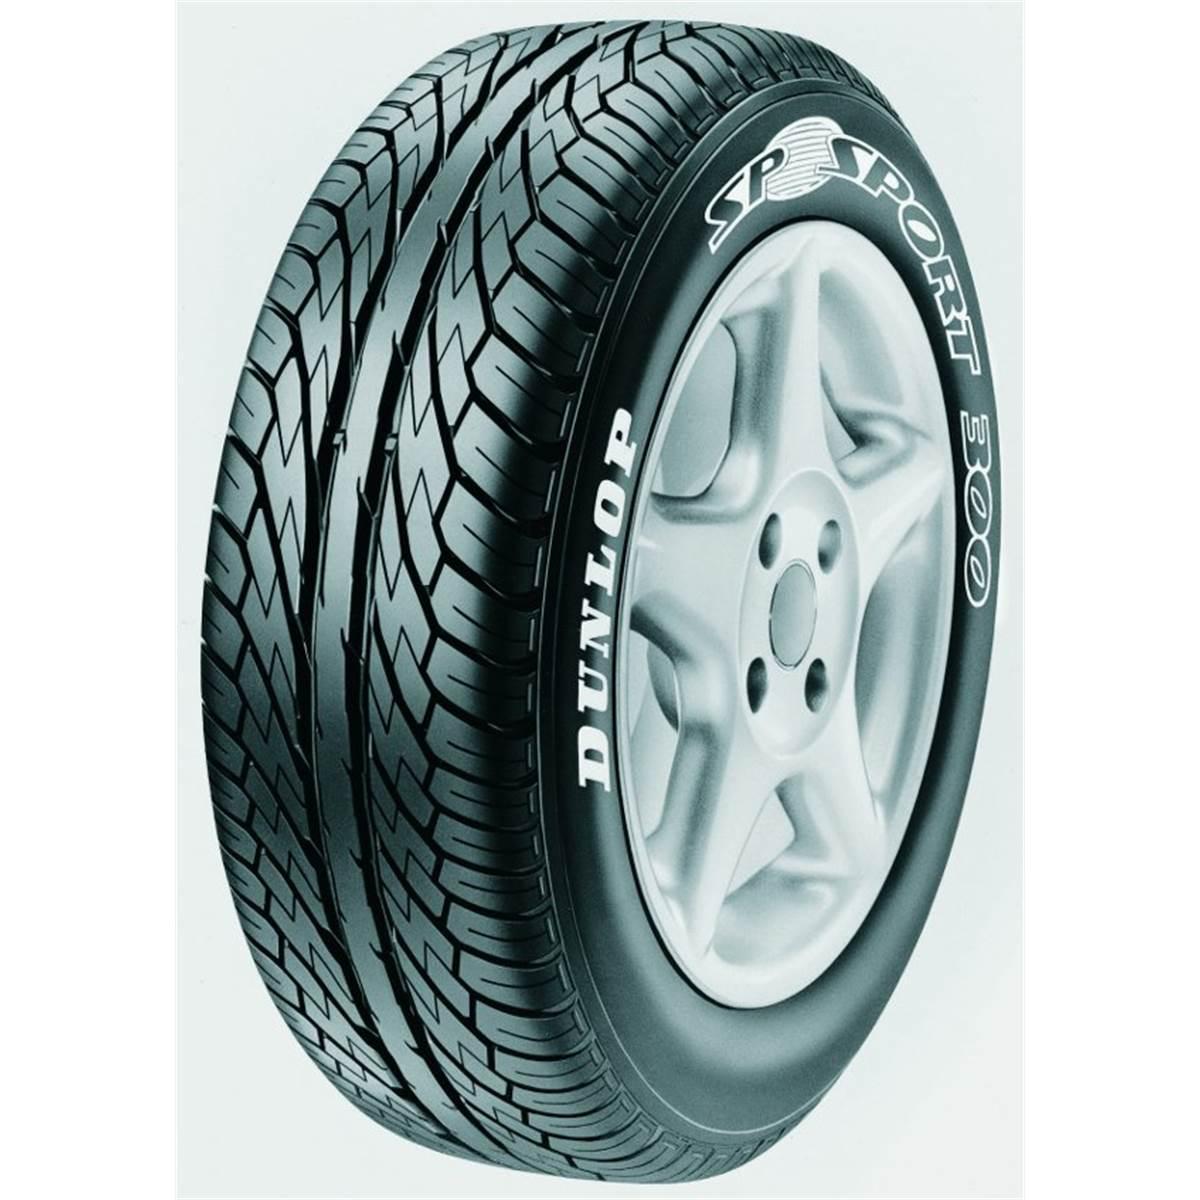 achat pneu dunlop sp sport 300 175 60 r15 81h pas cher. Black Bedroom Furniture Sets. Home Design Ideas